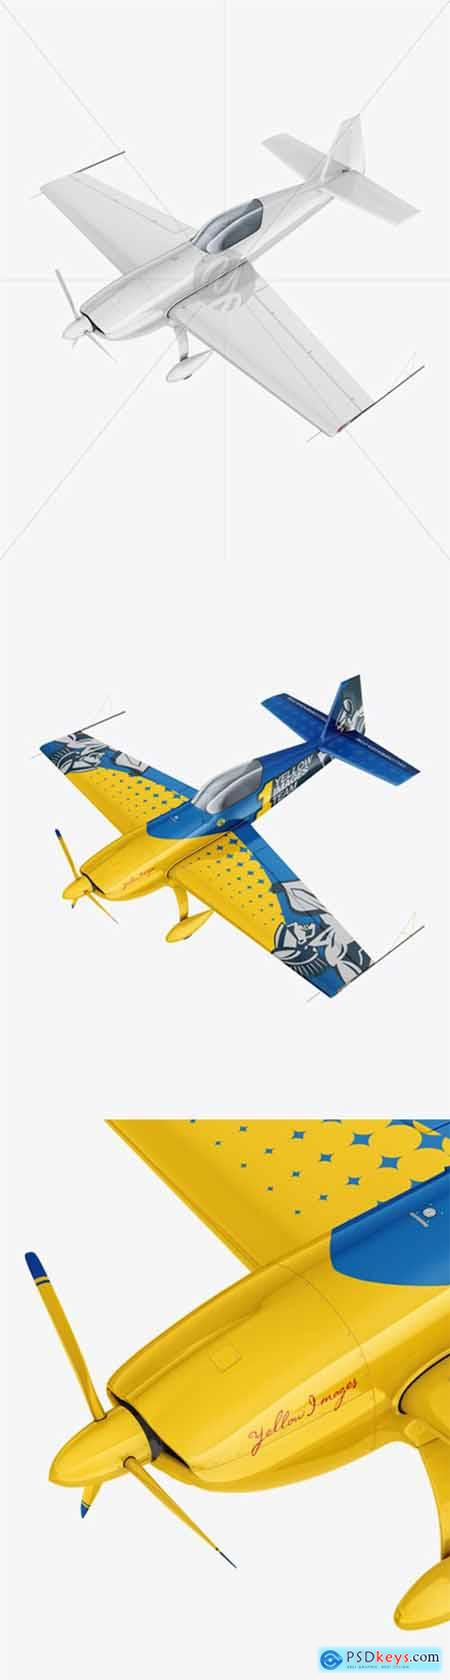 Sport Airplane Mockup - Half Side View 56008